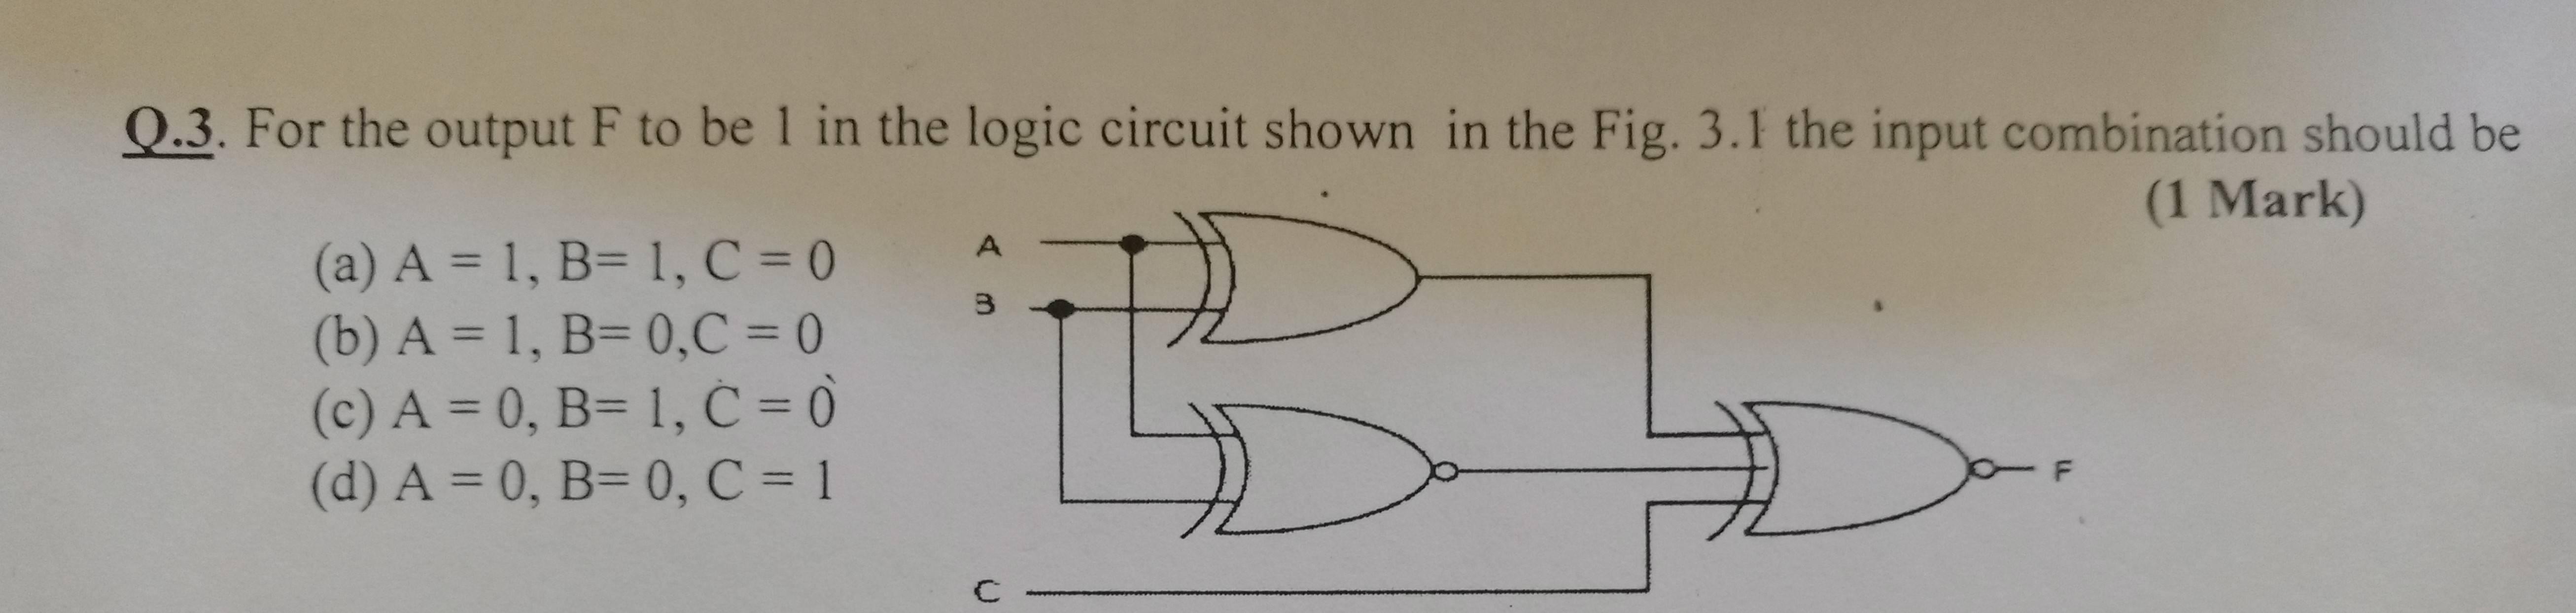 Circuit 4 Input And Logic Enlarge